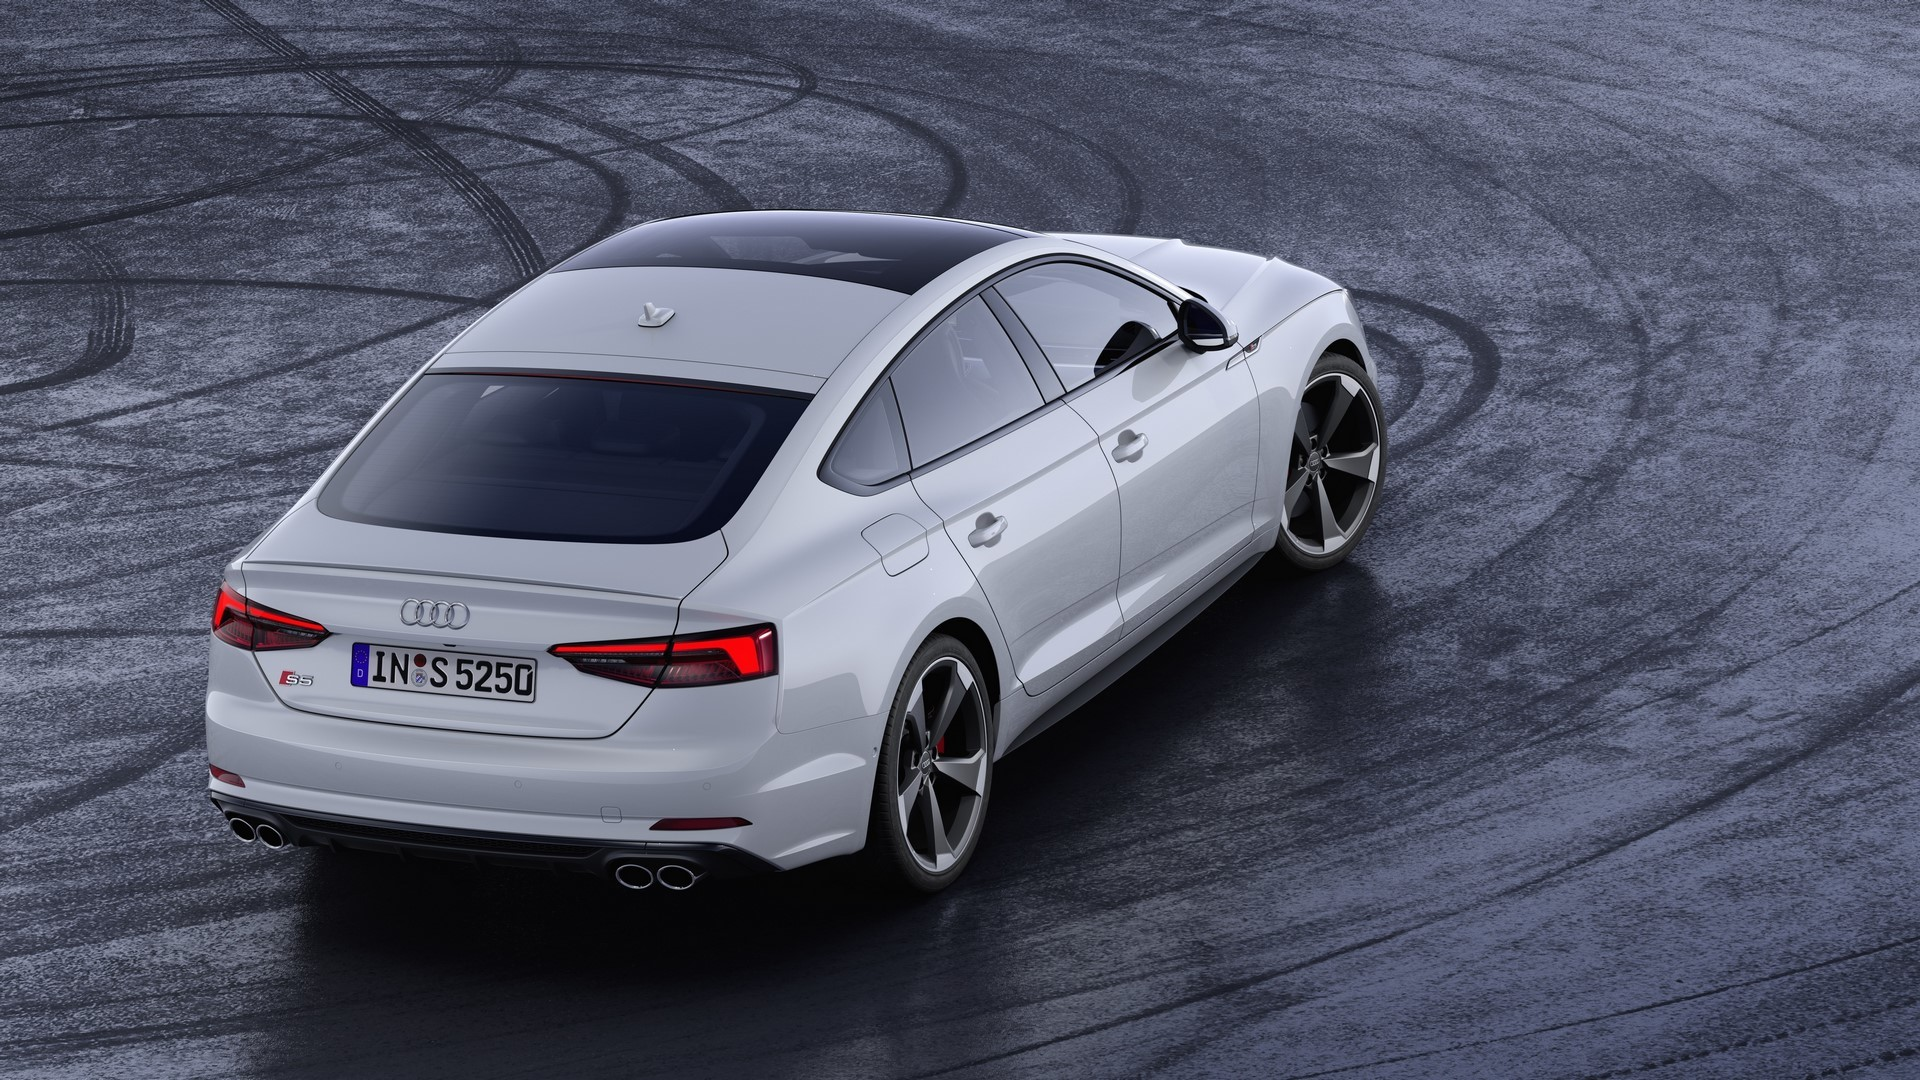 Audi-S5-TDI-Sportback-12